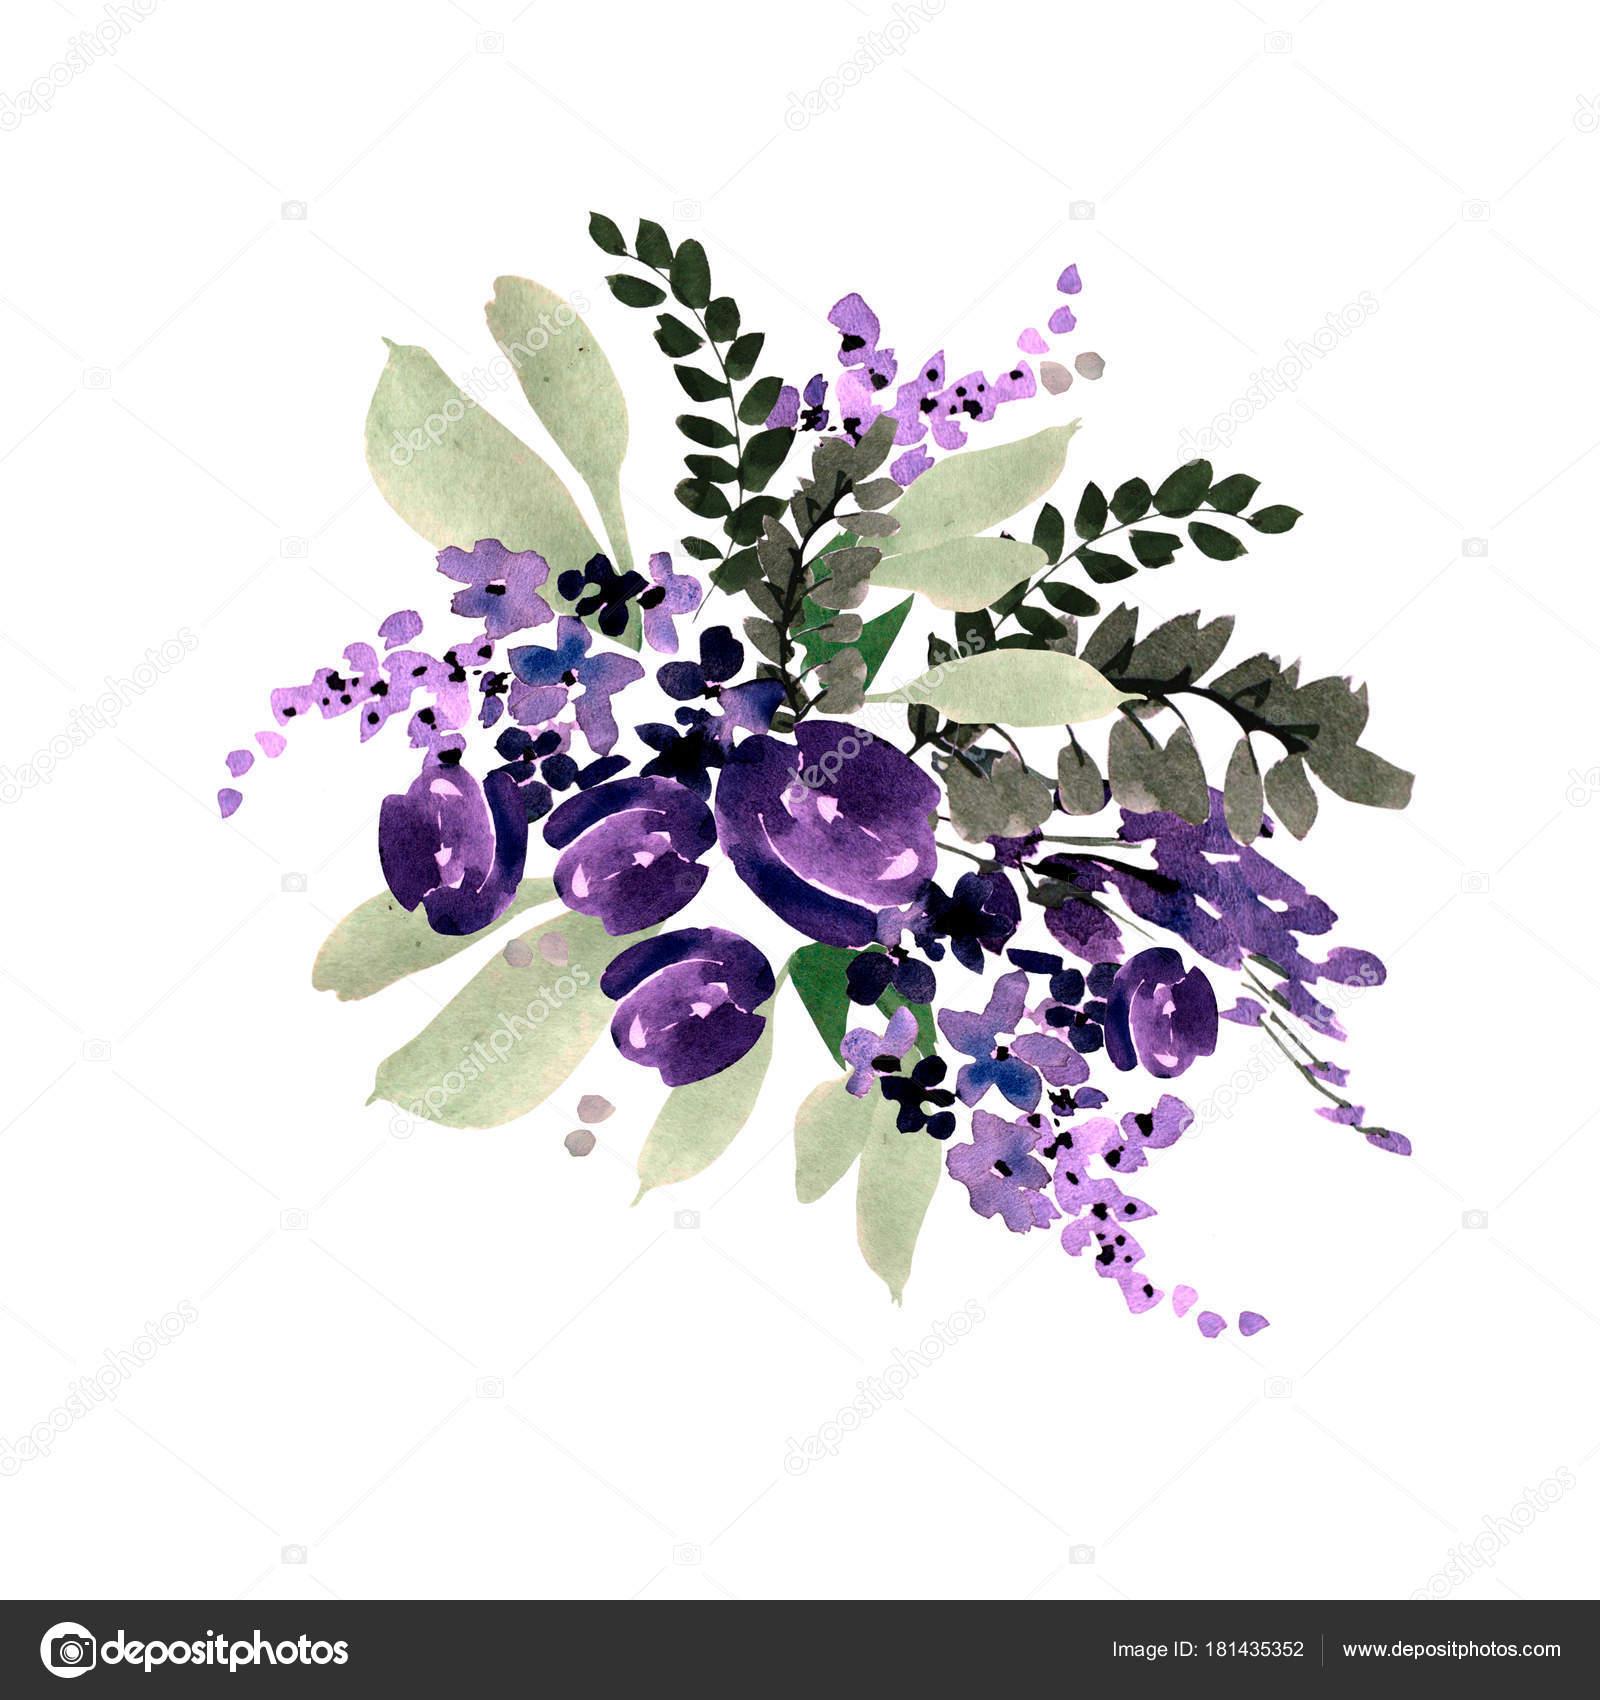 Beautiful watercolor wedding bouquet with purple flowers stock beautiful watercolor wedding bouquet with purple flowers illustration photo by knopazyzy izmirmasajfo